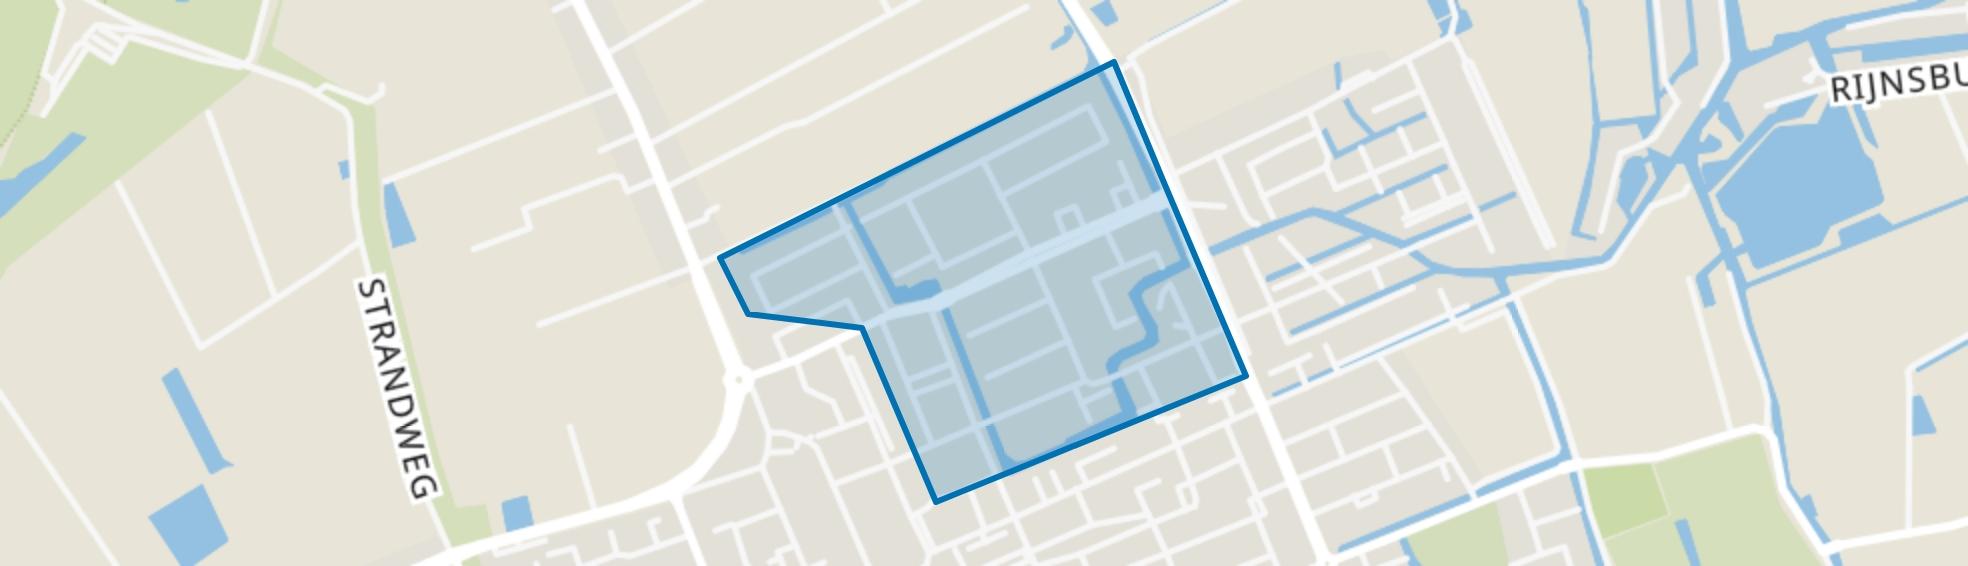 Vreeburgh, 's-Gravenzande map